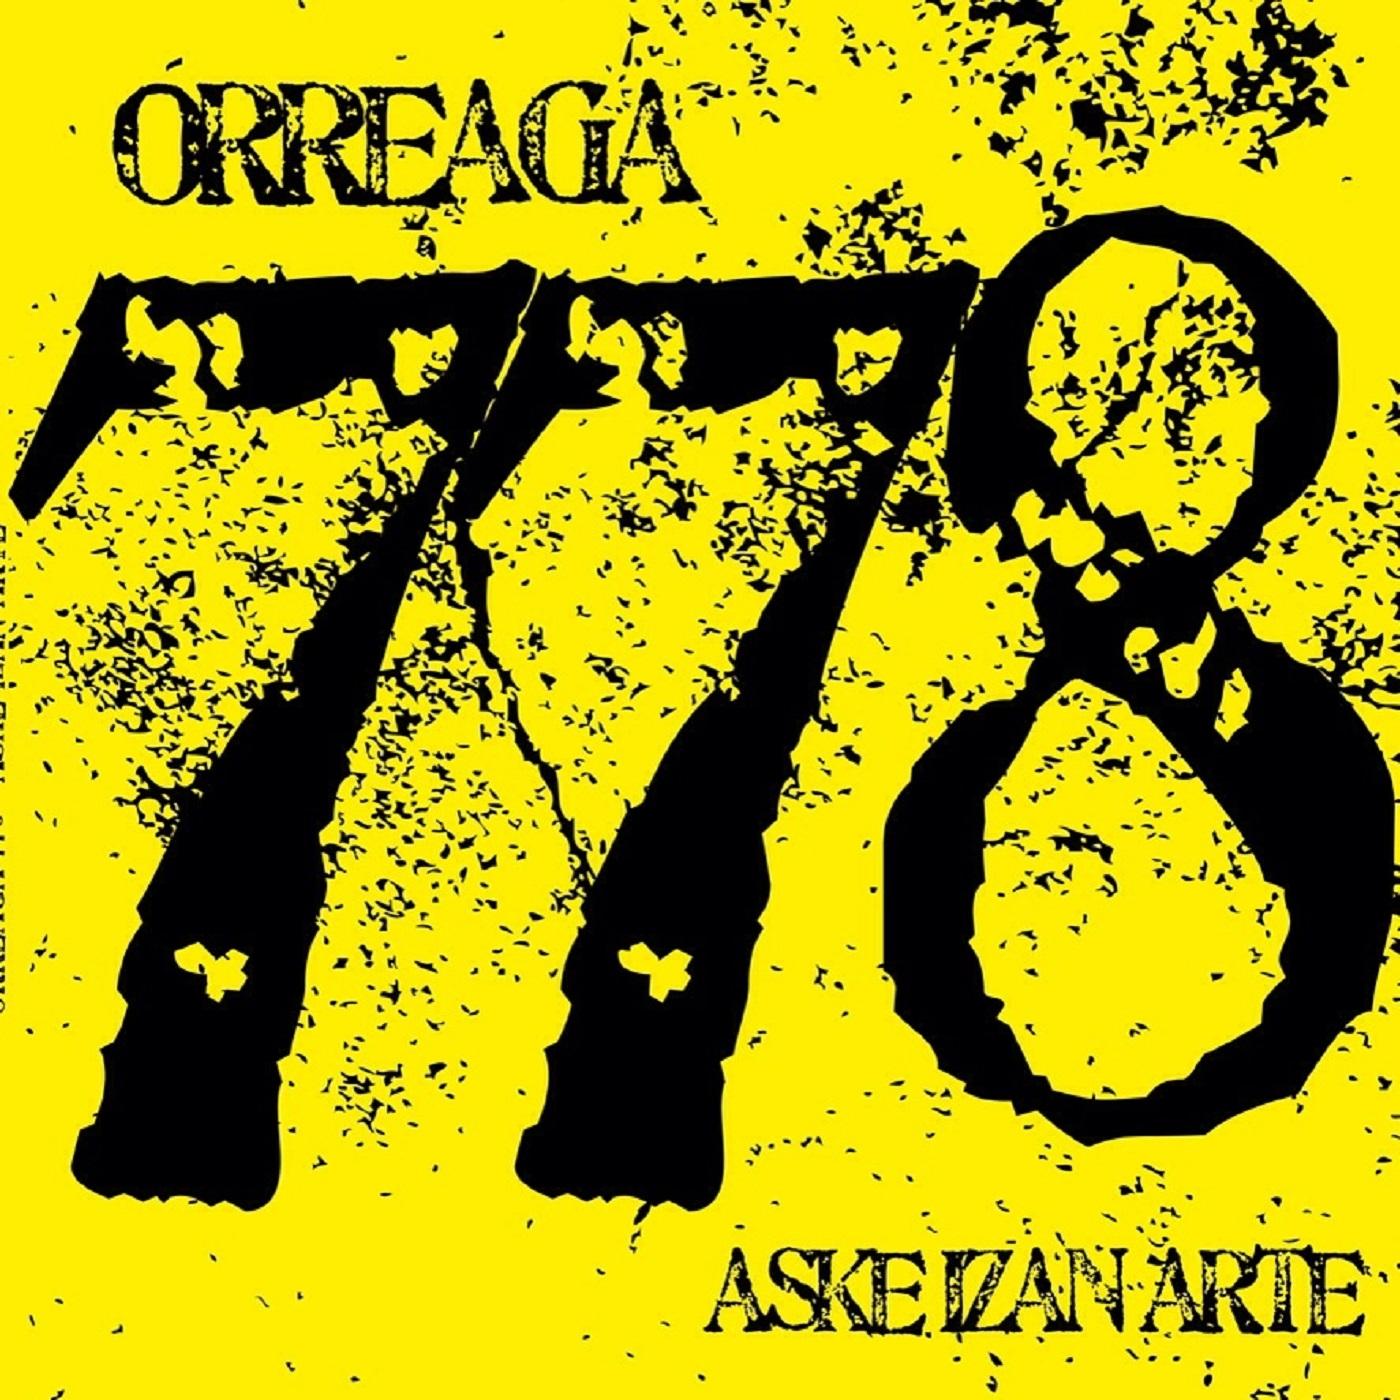 portada del album Aske Izan Arte